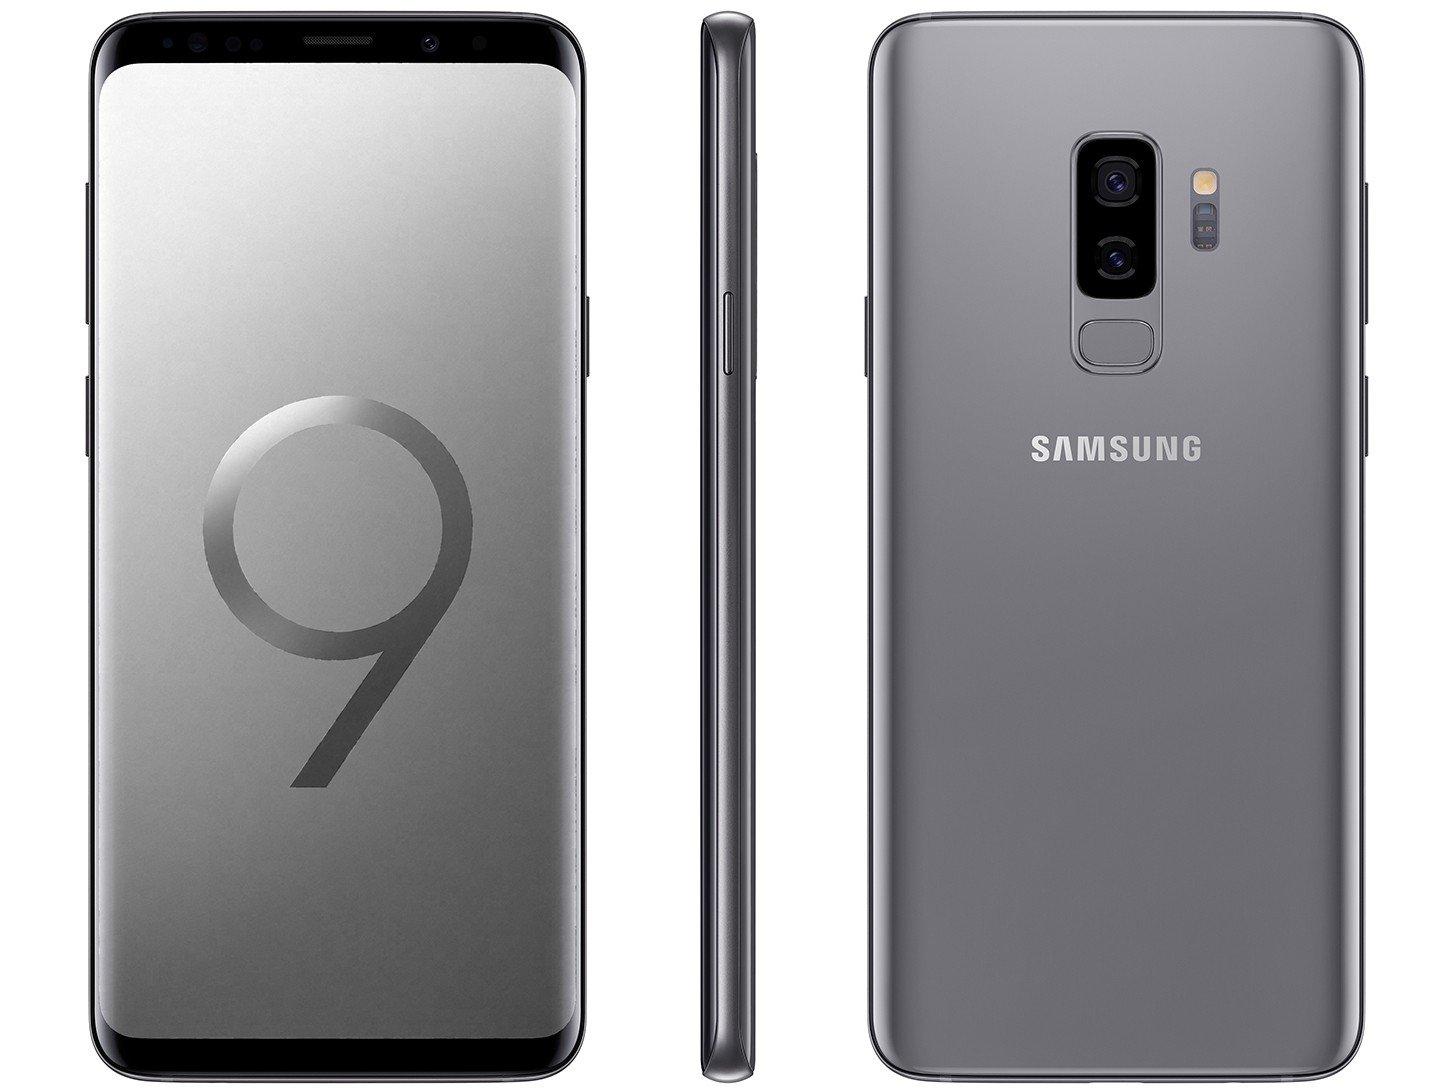 Foto 1 - Smartphone Samsung Galaxy S9+ 128GB Cinza 4G - 6GB RAM Tela 6,2 Câm. Dupla + Câm. Selfie 8MP